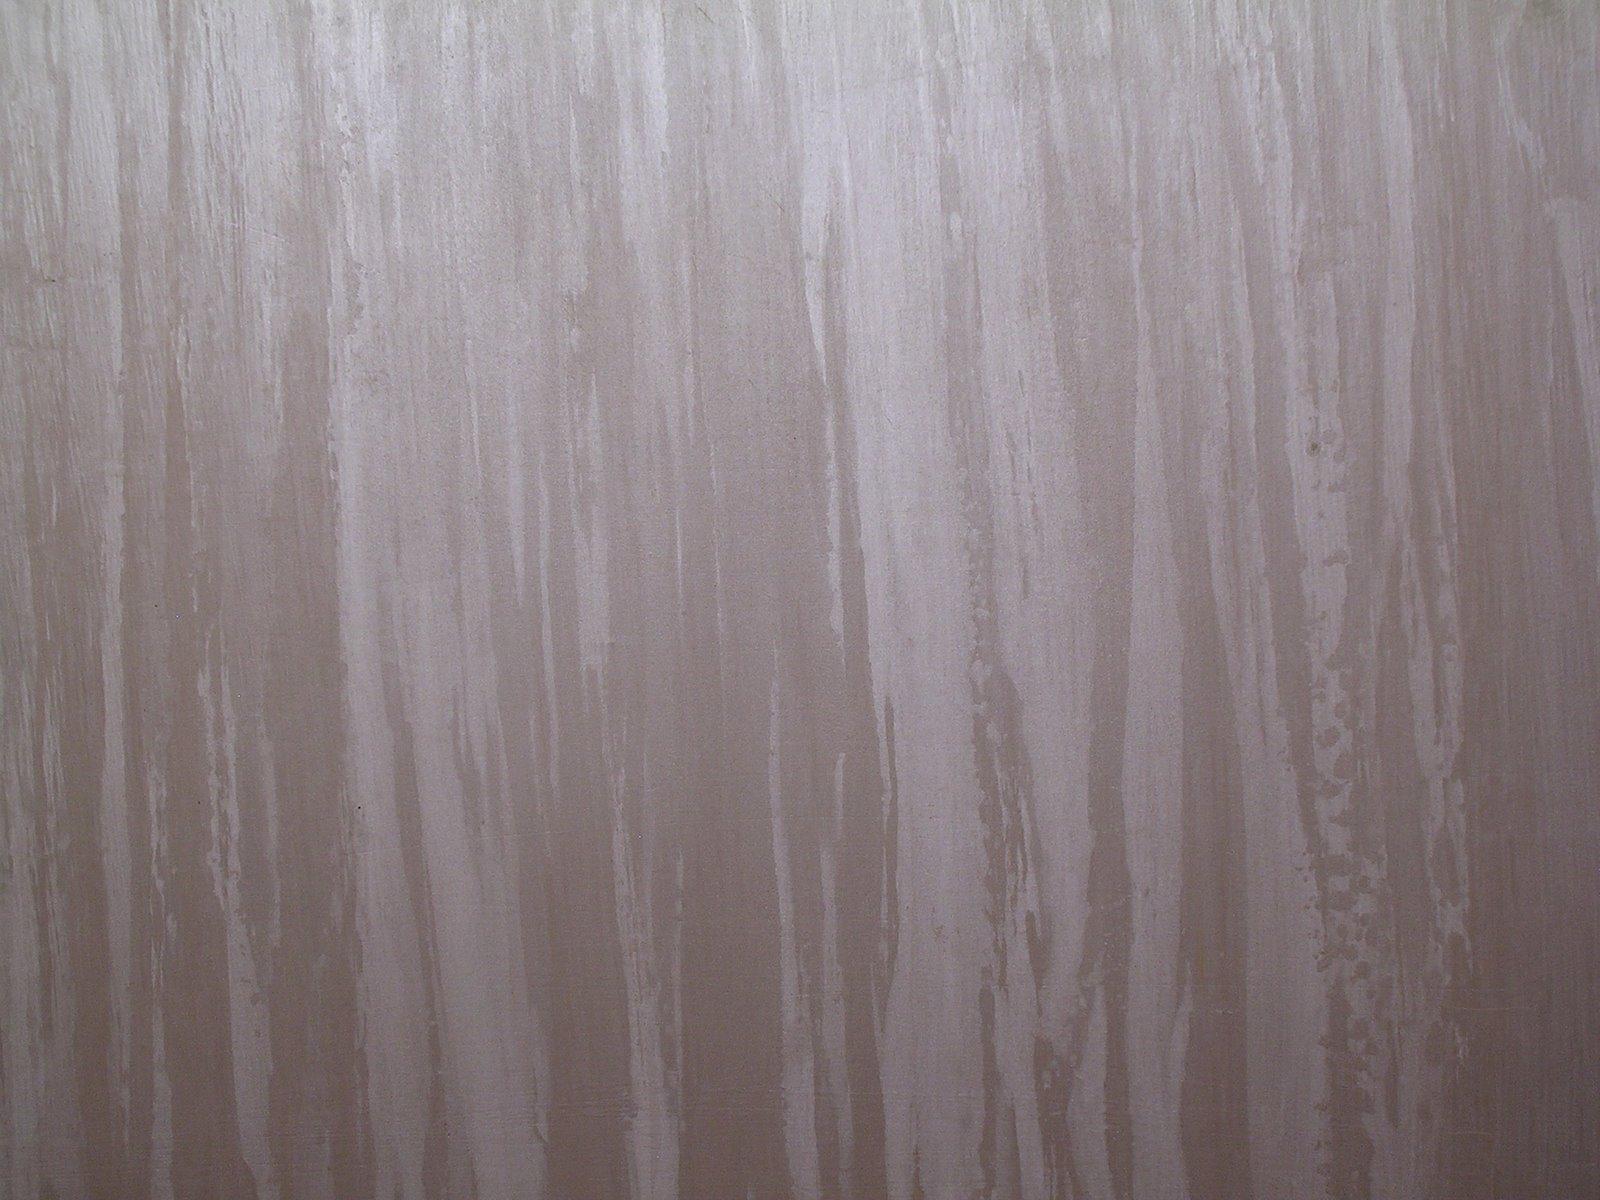 Pittura Pareti Effetto Seta : Stucco per pareti effetto seta